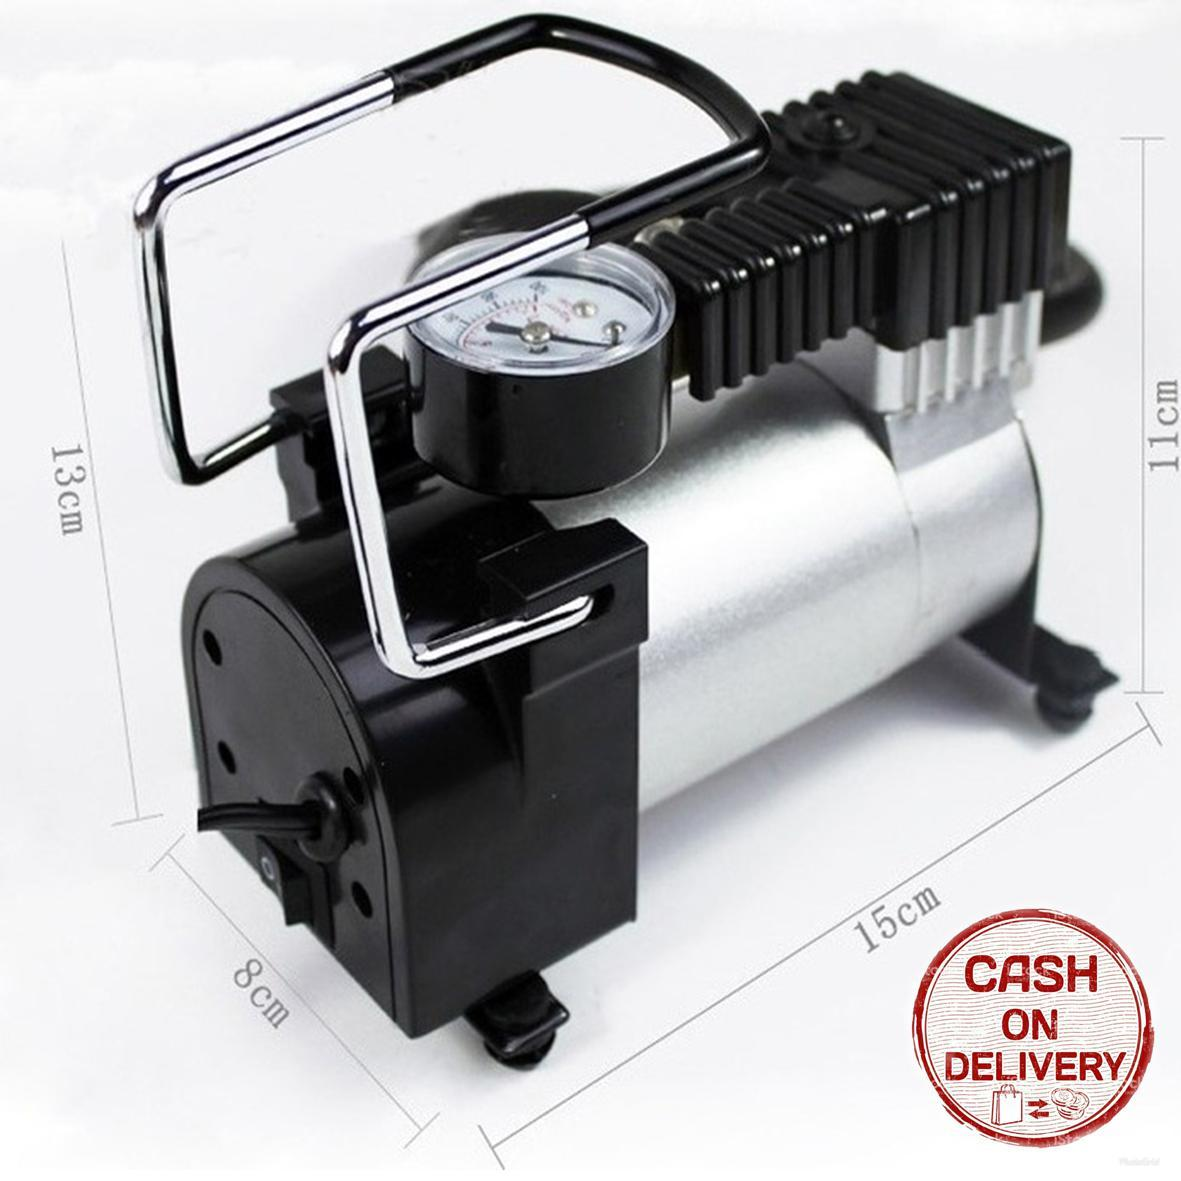 Cek Harga Baru Bestguard Perkakas Pompa Injak 1 Tabung High Preasure Kaki Sien Collection Ban Tekanan Tinggi Heavy Duty Air Compressor Kompresor Mobil